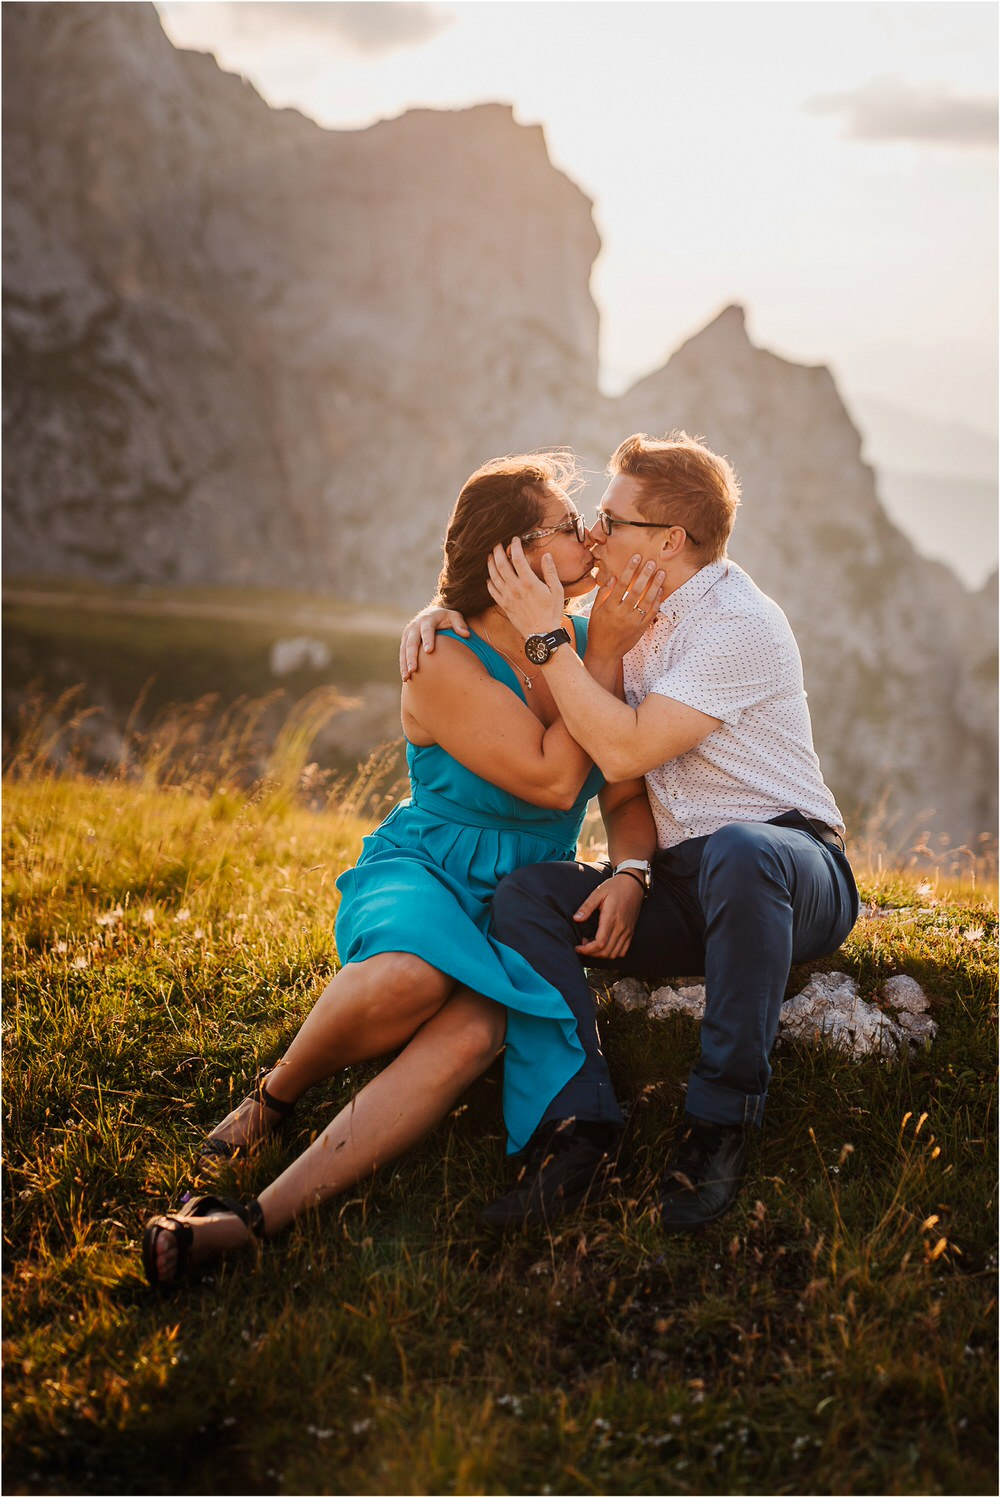 tuscany wedding photographer greece croatia dubrovnik vjencanje hochzeit wedding photography photos romantic engagement nika grega 0126.jpg